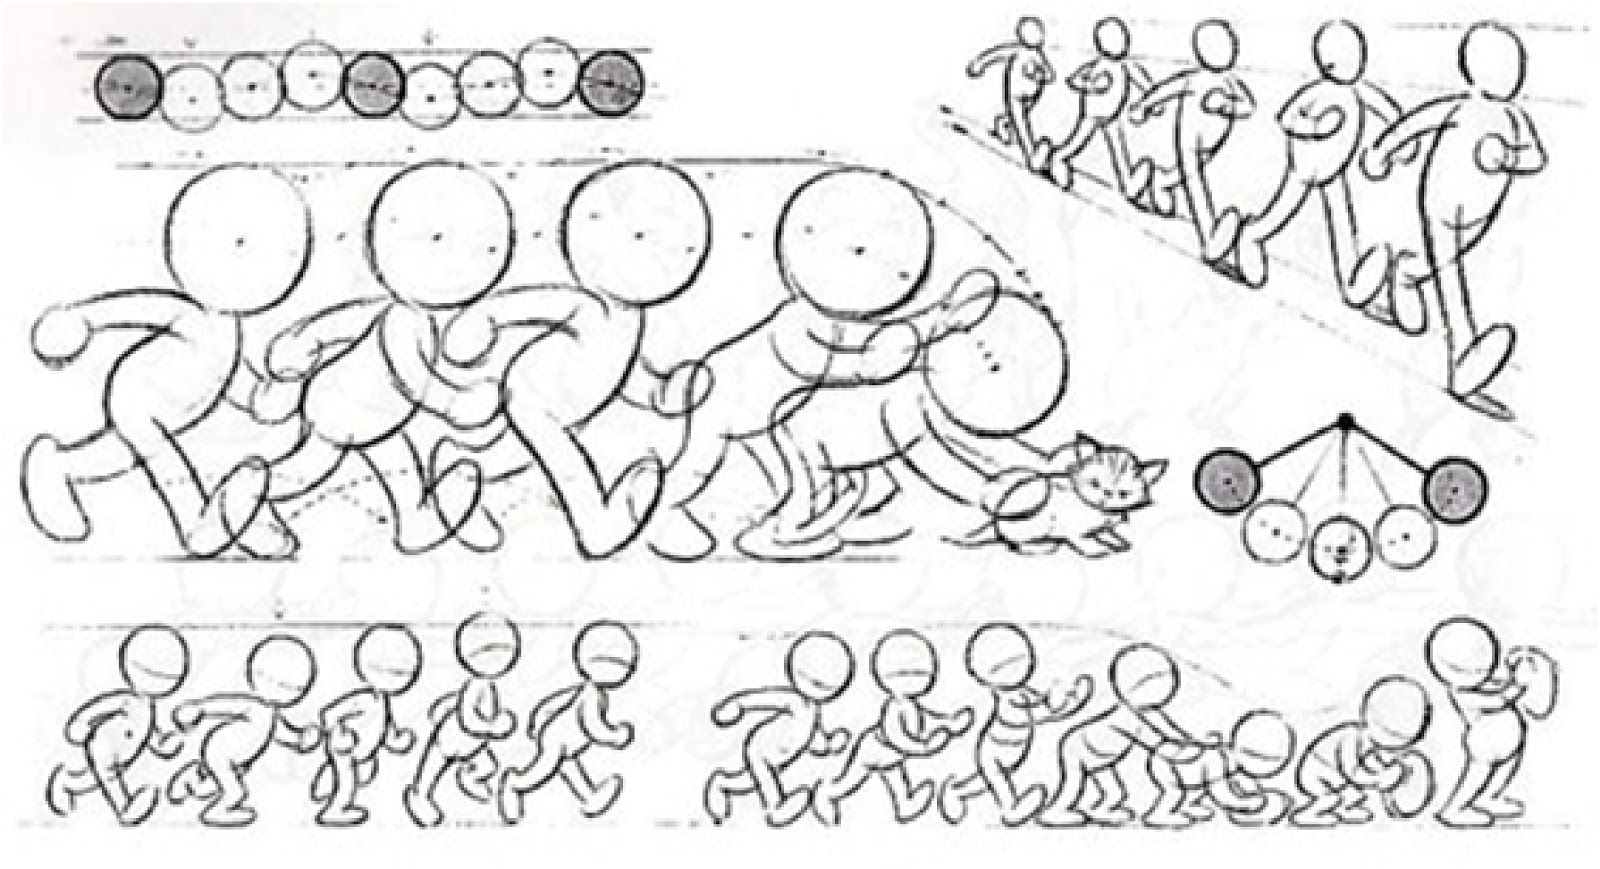 4 1 Jpg 1600 869 Principles Of Animation 12 Principles Of Animation Animation Sketches